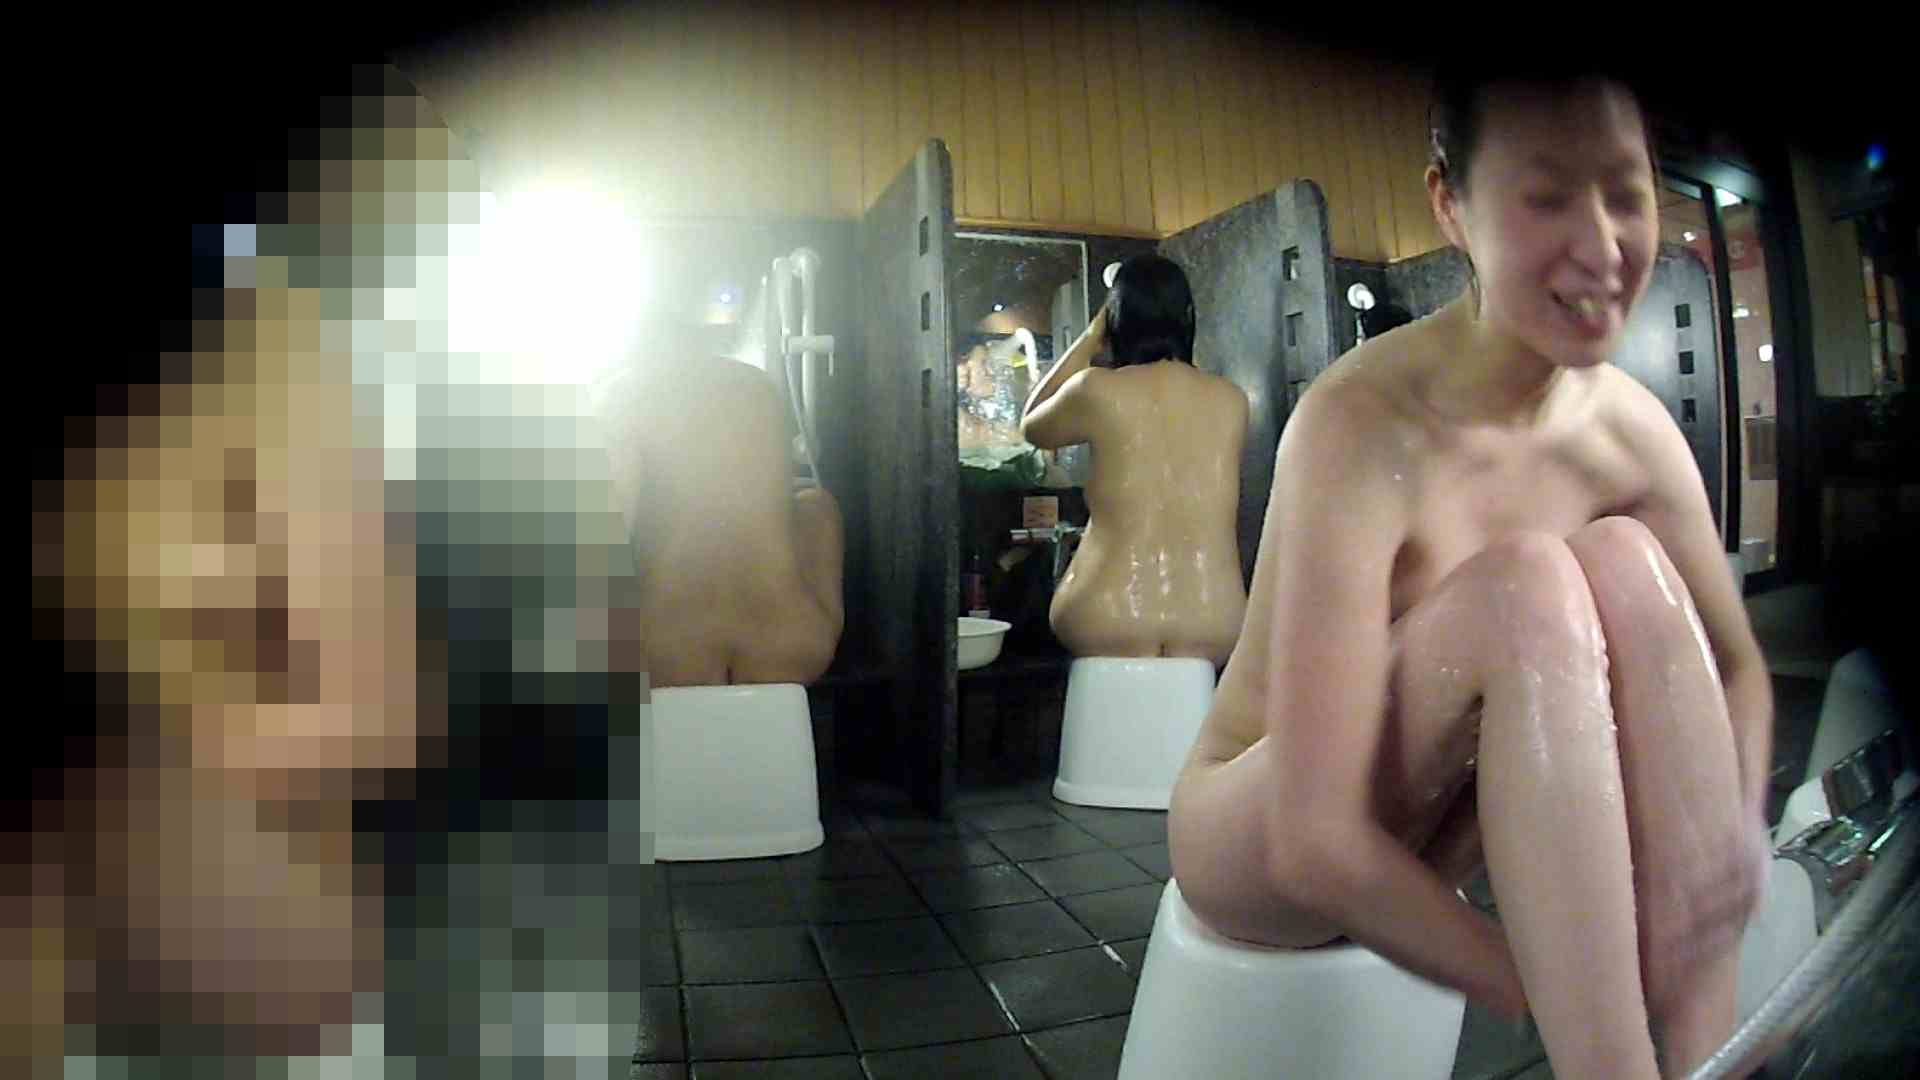 潜入女盗撮師のスーパー銭湯 Vol.02 銭湯事情  89枚 63